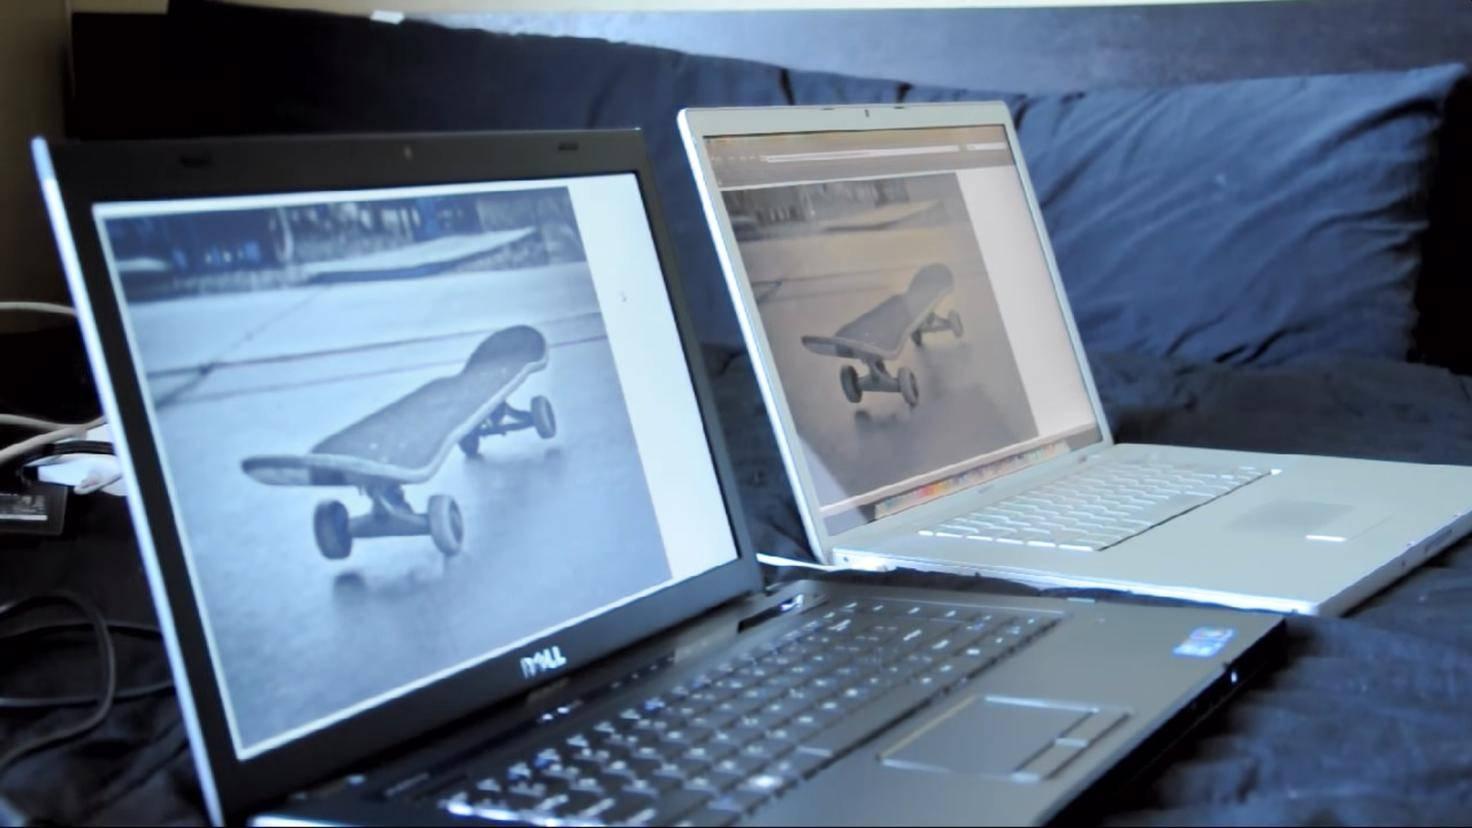 dell-vostro-3500-notebook-laptop